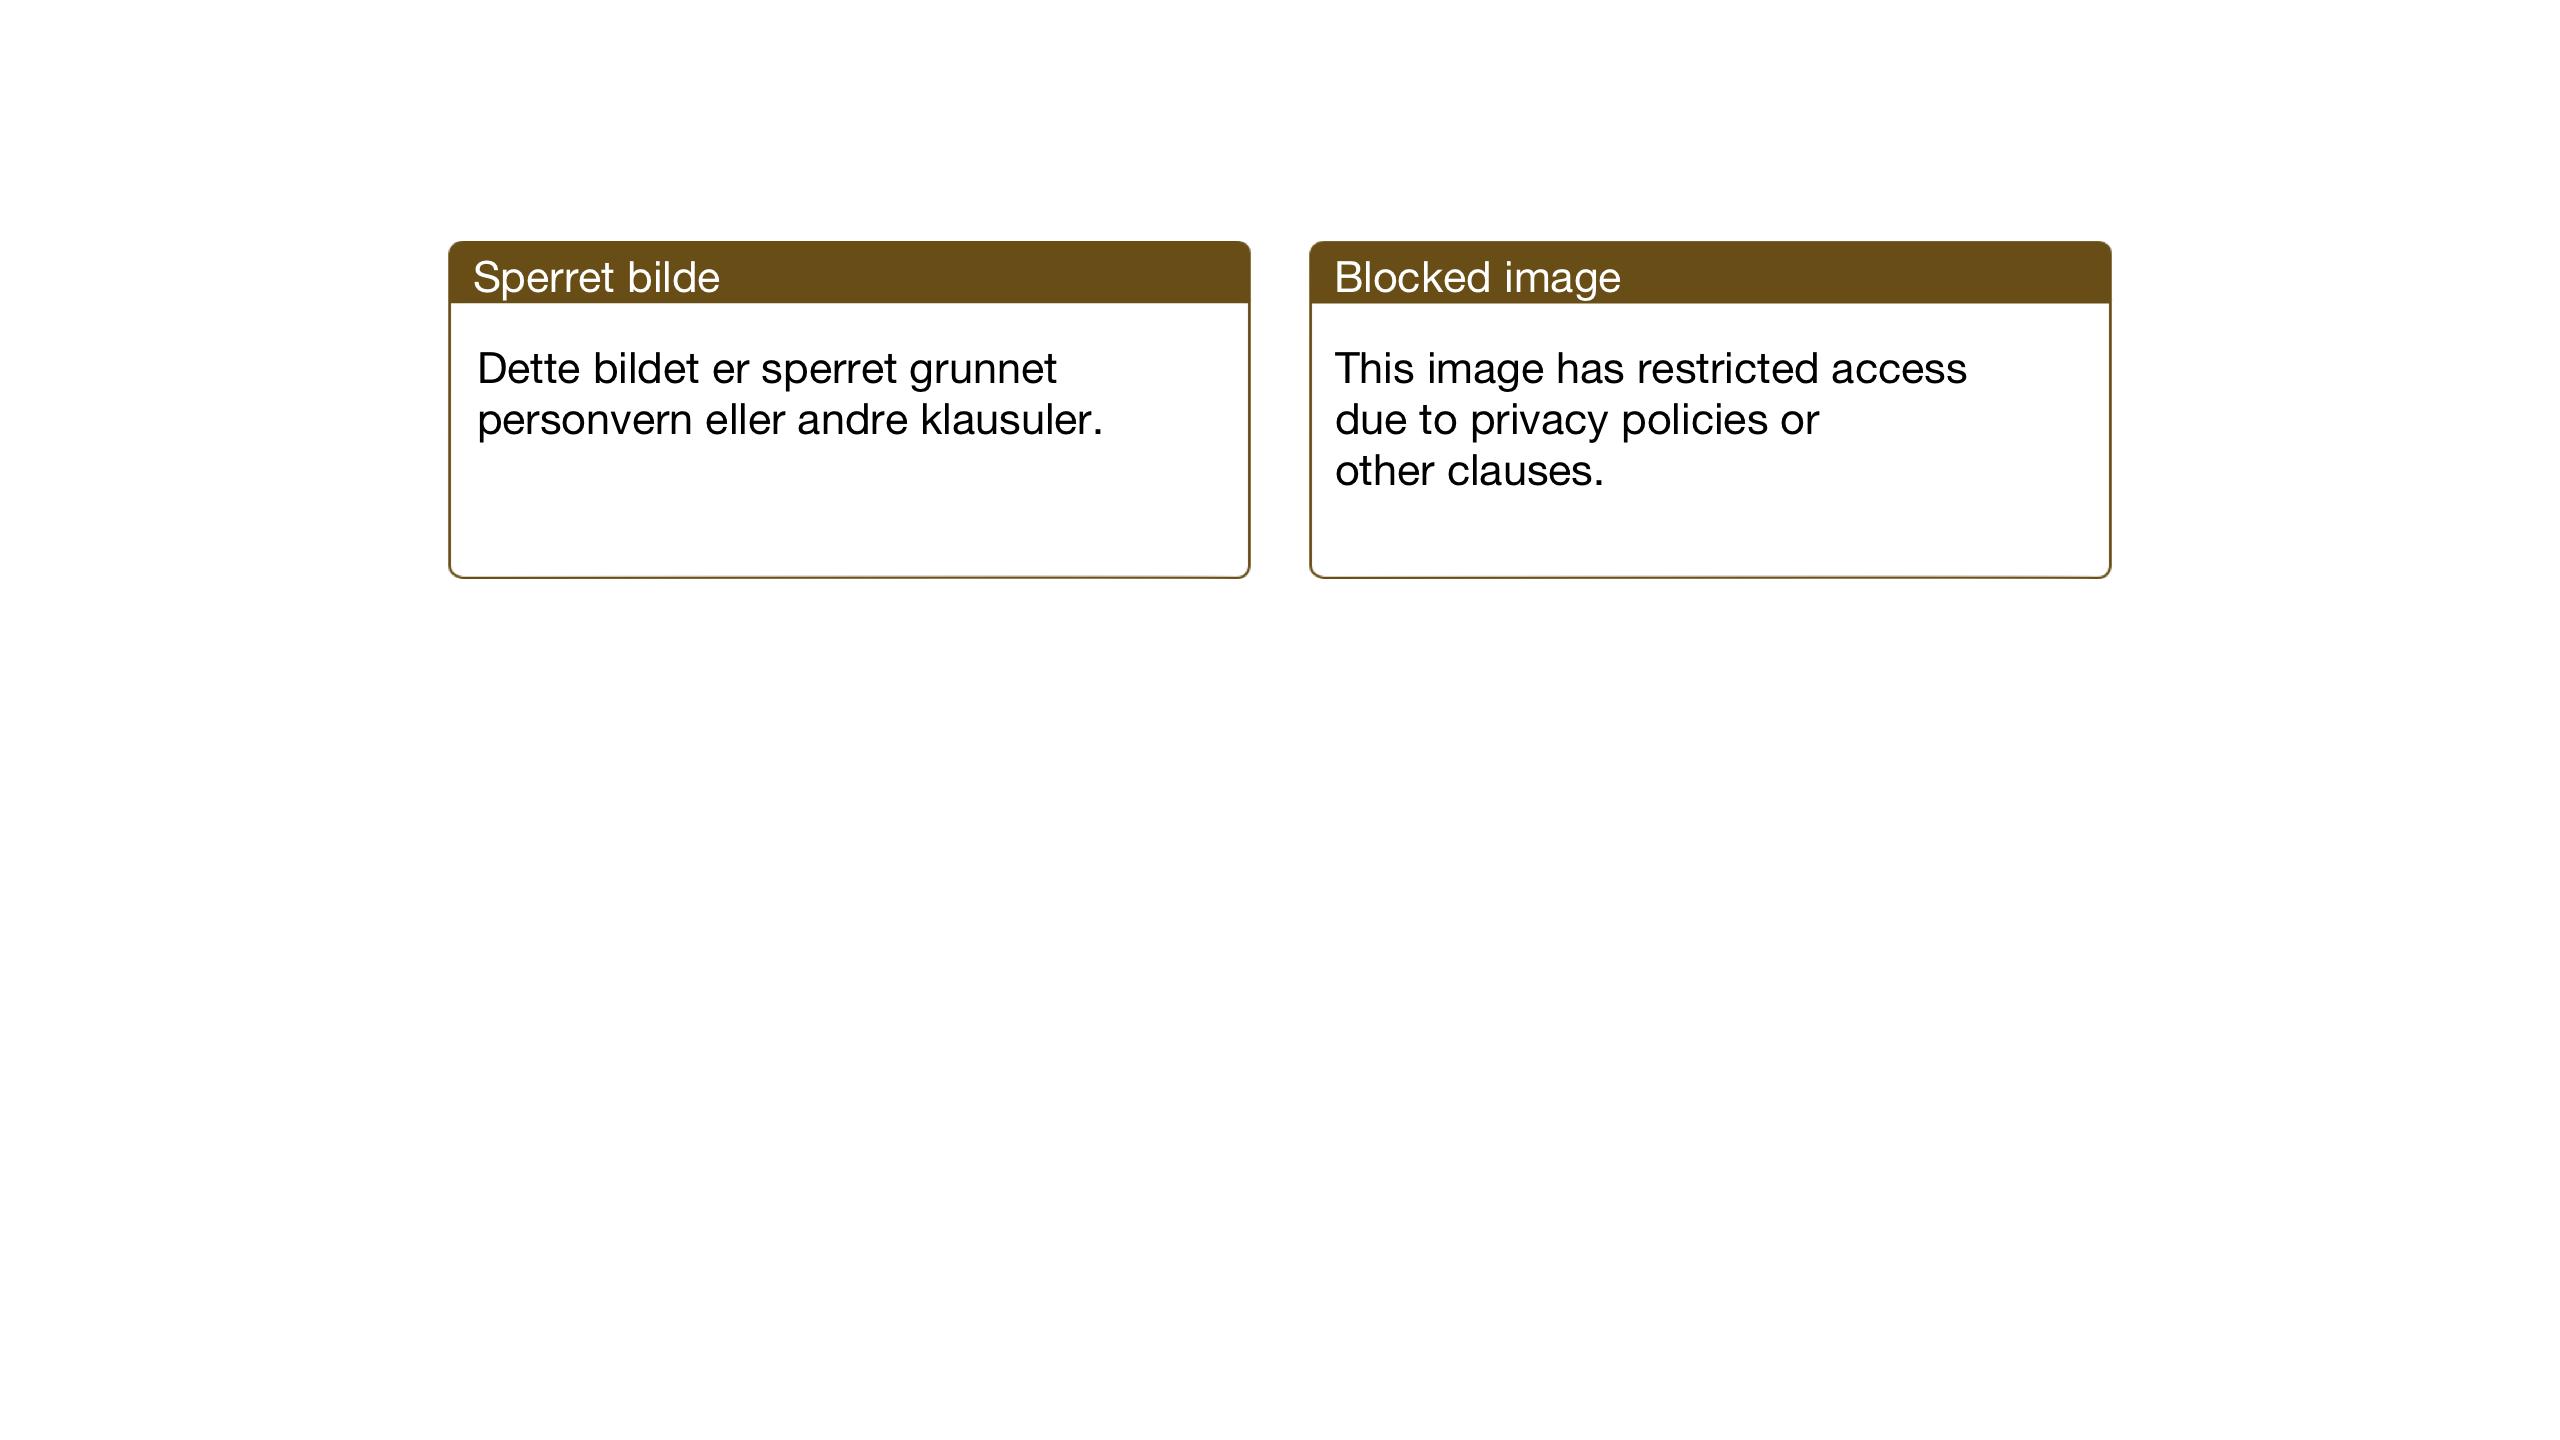 SAB, Domkirken Sokneprestembete, H/Haa: Ministerialbok nr. C 9, 1958-2001, s. 88b-89a